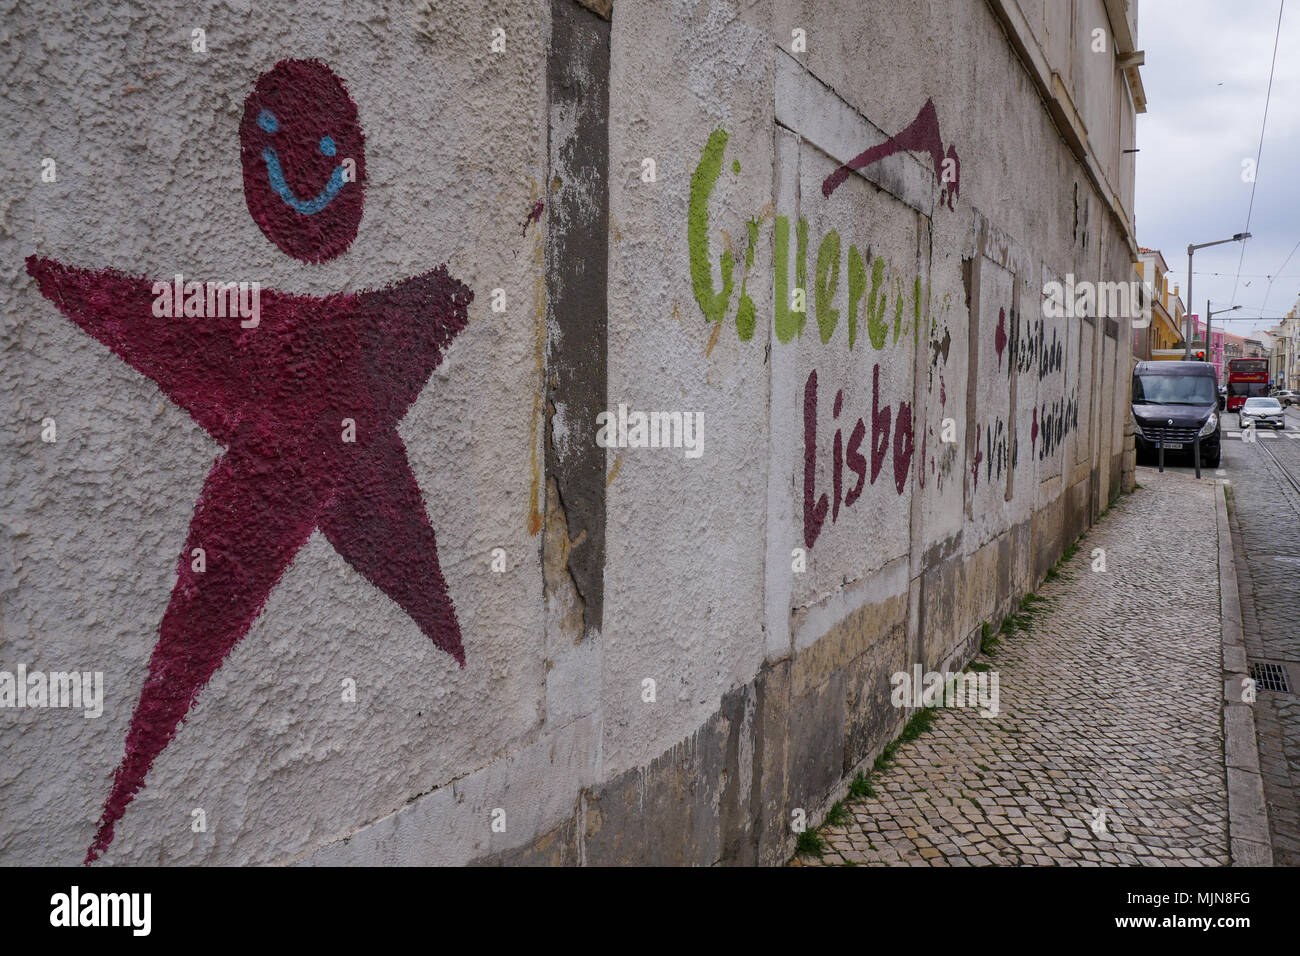 Street view con grffiris colorati, quartiere Belem, Lisbona, Portogallo Foto Stock